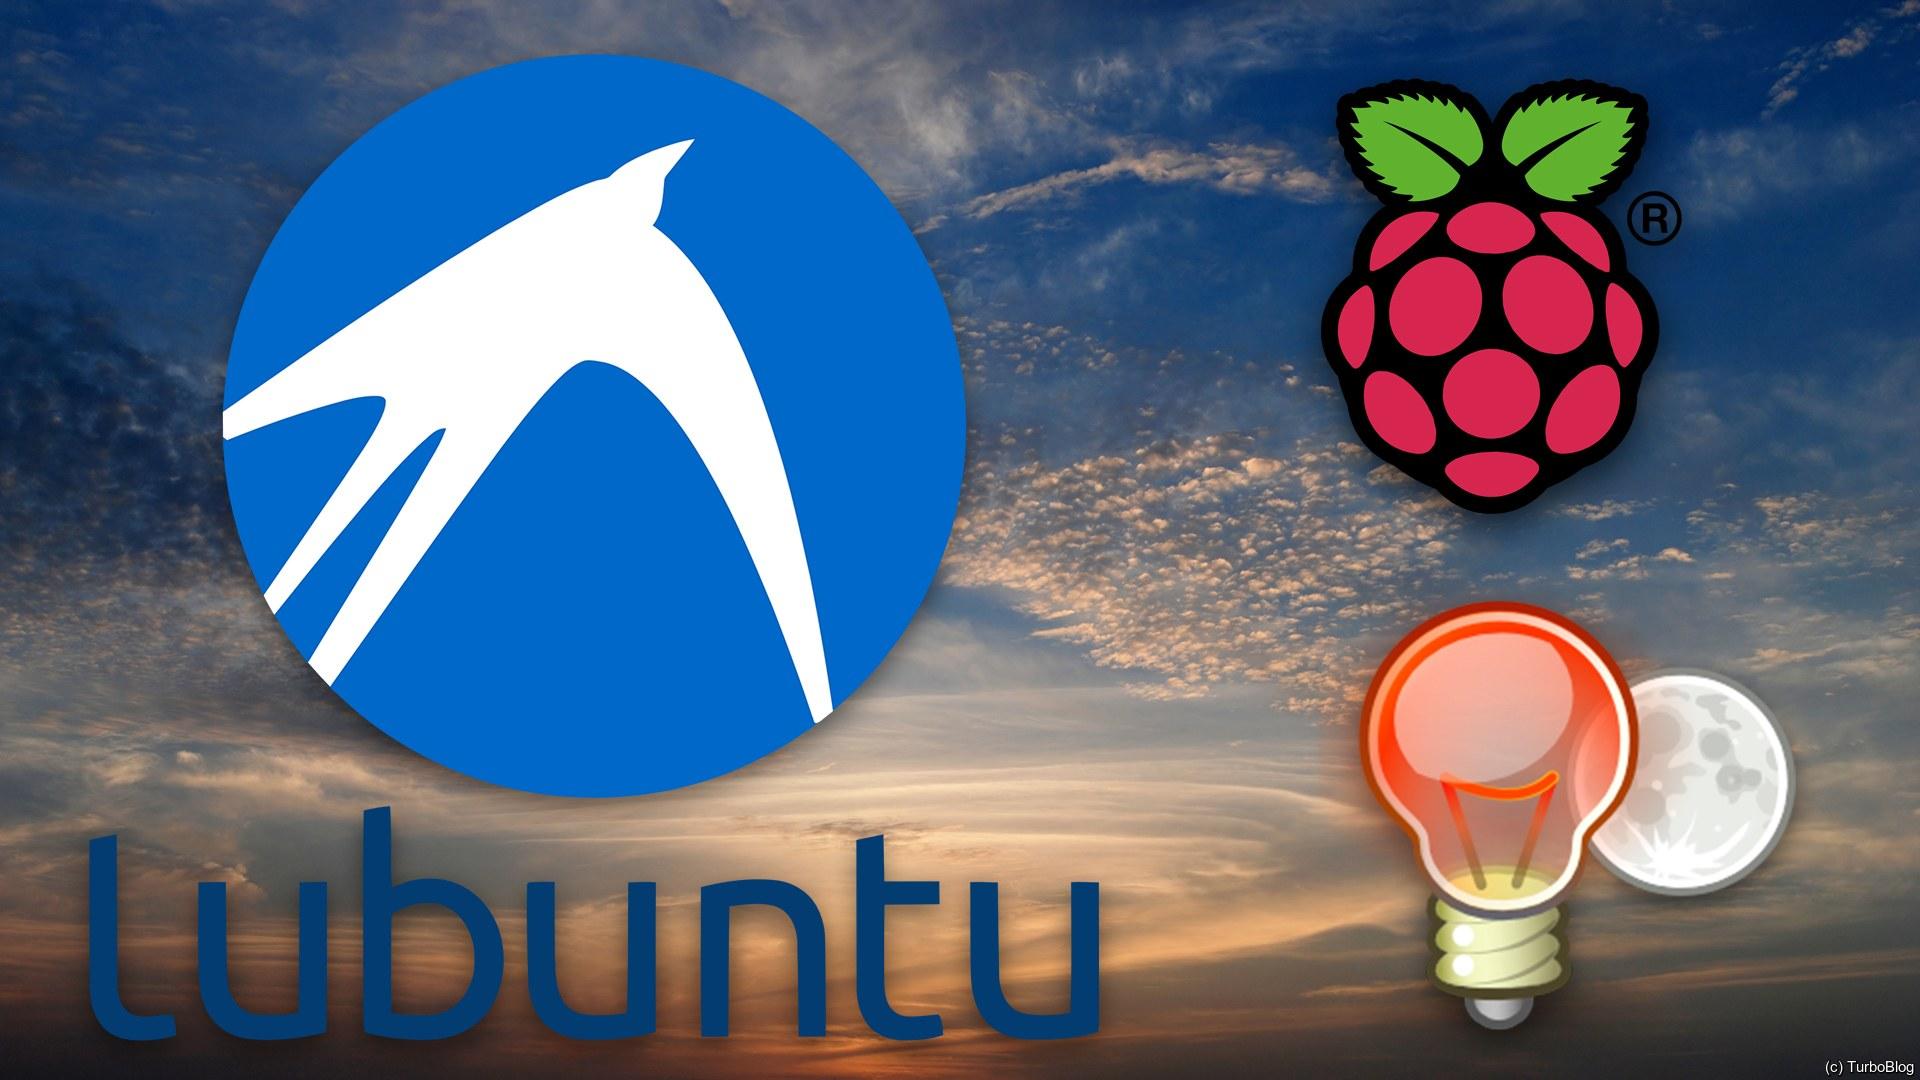 Lubuntu raspberry pi 2 download